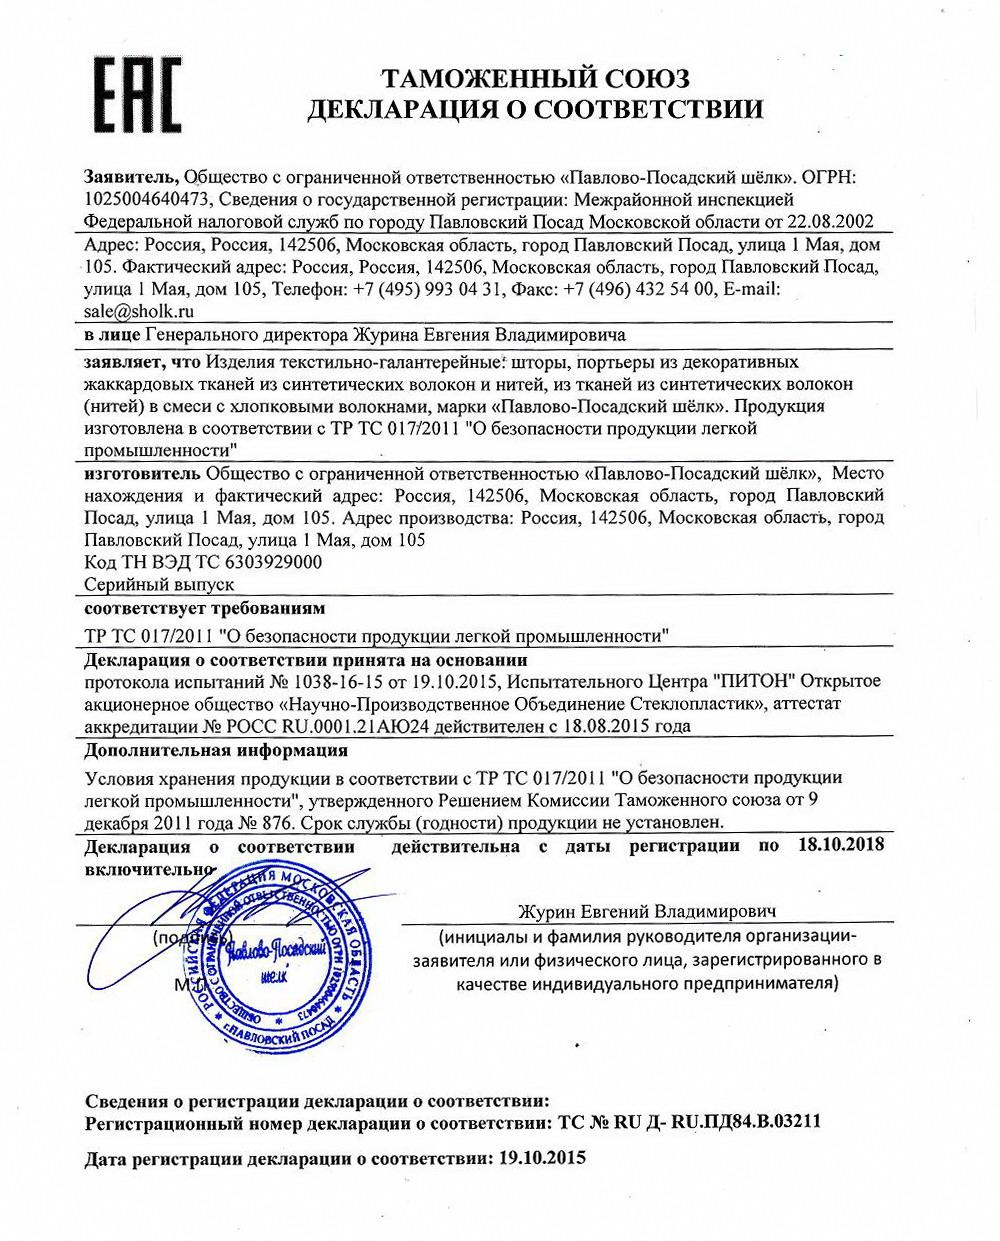 Таможенная декларация на шторы Павлов Посад